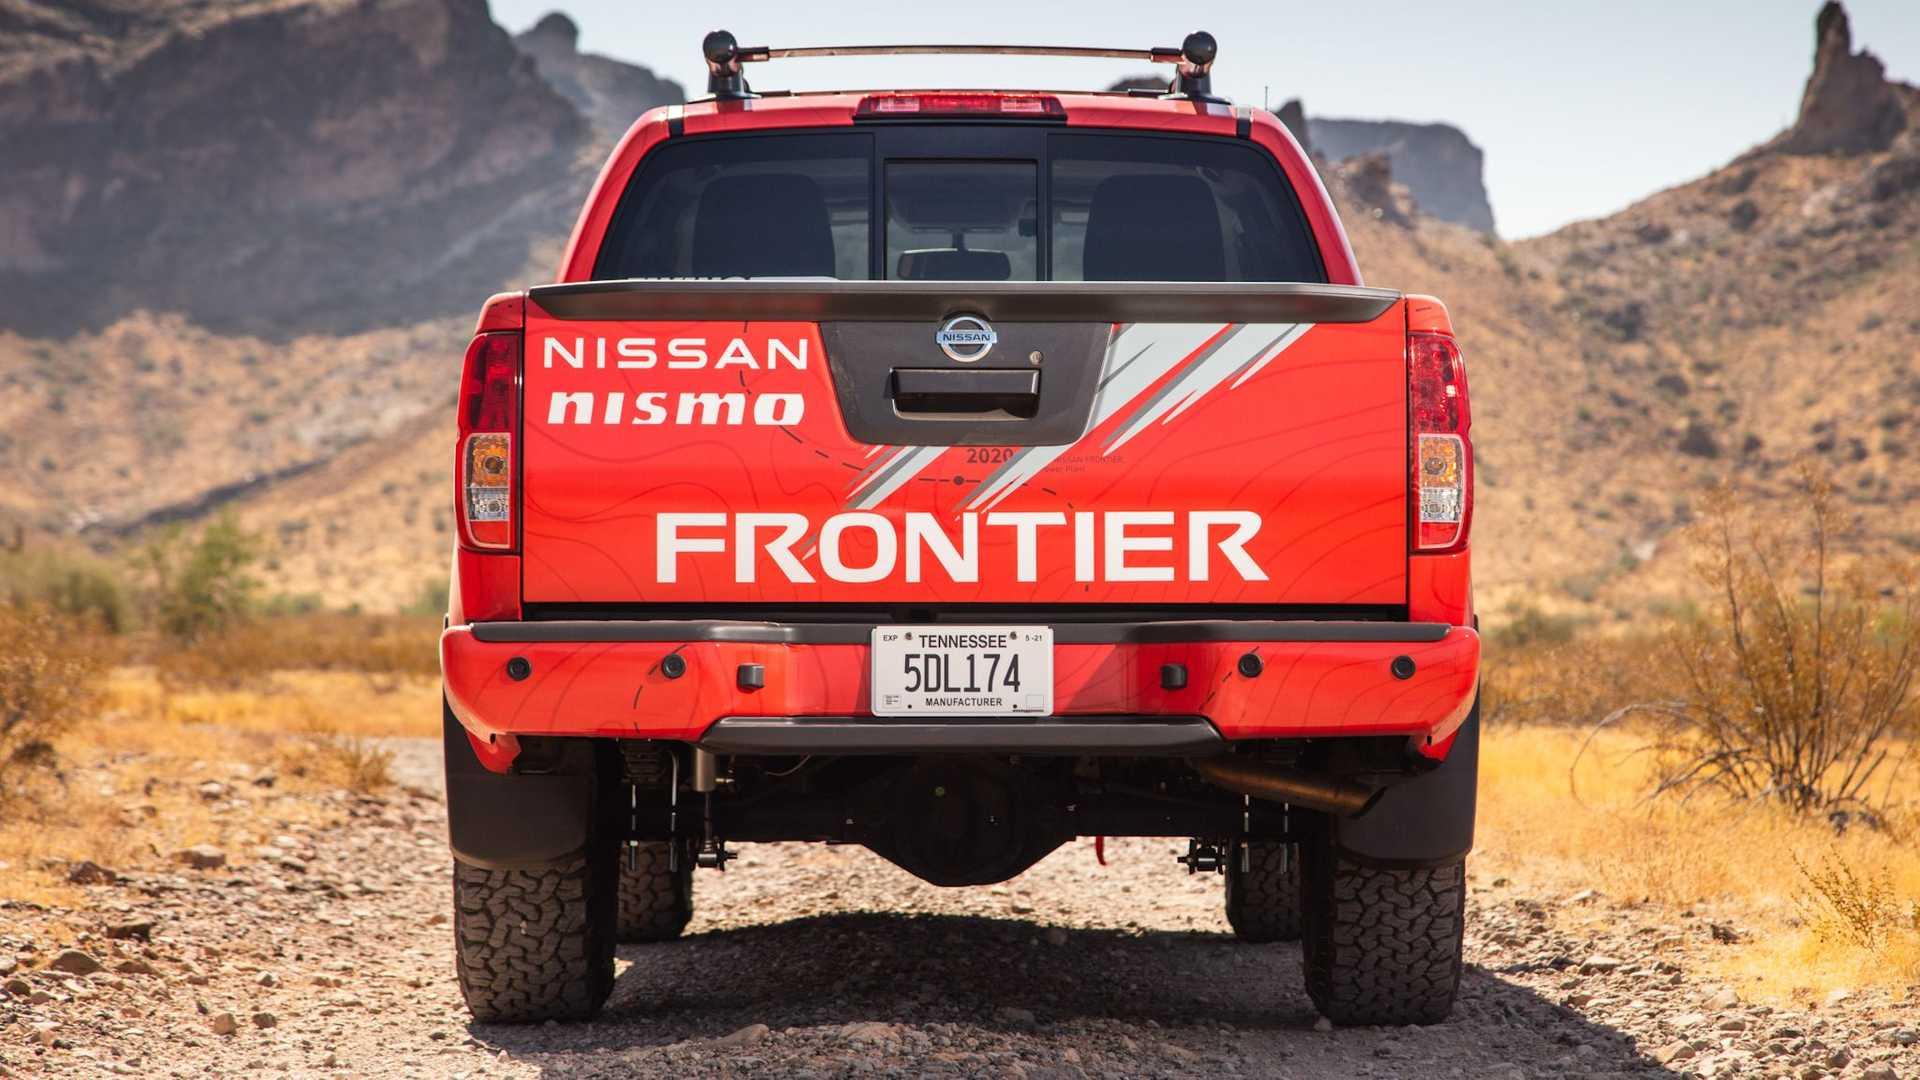 2020-nissan-frontier-bumper-nismo-9